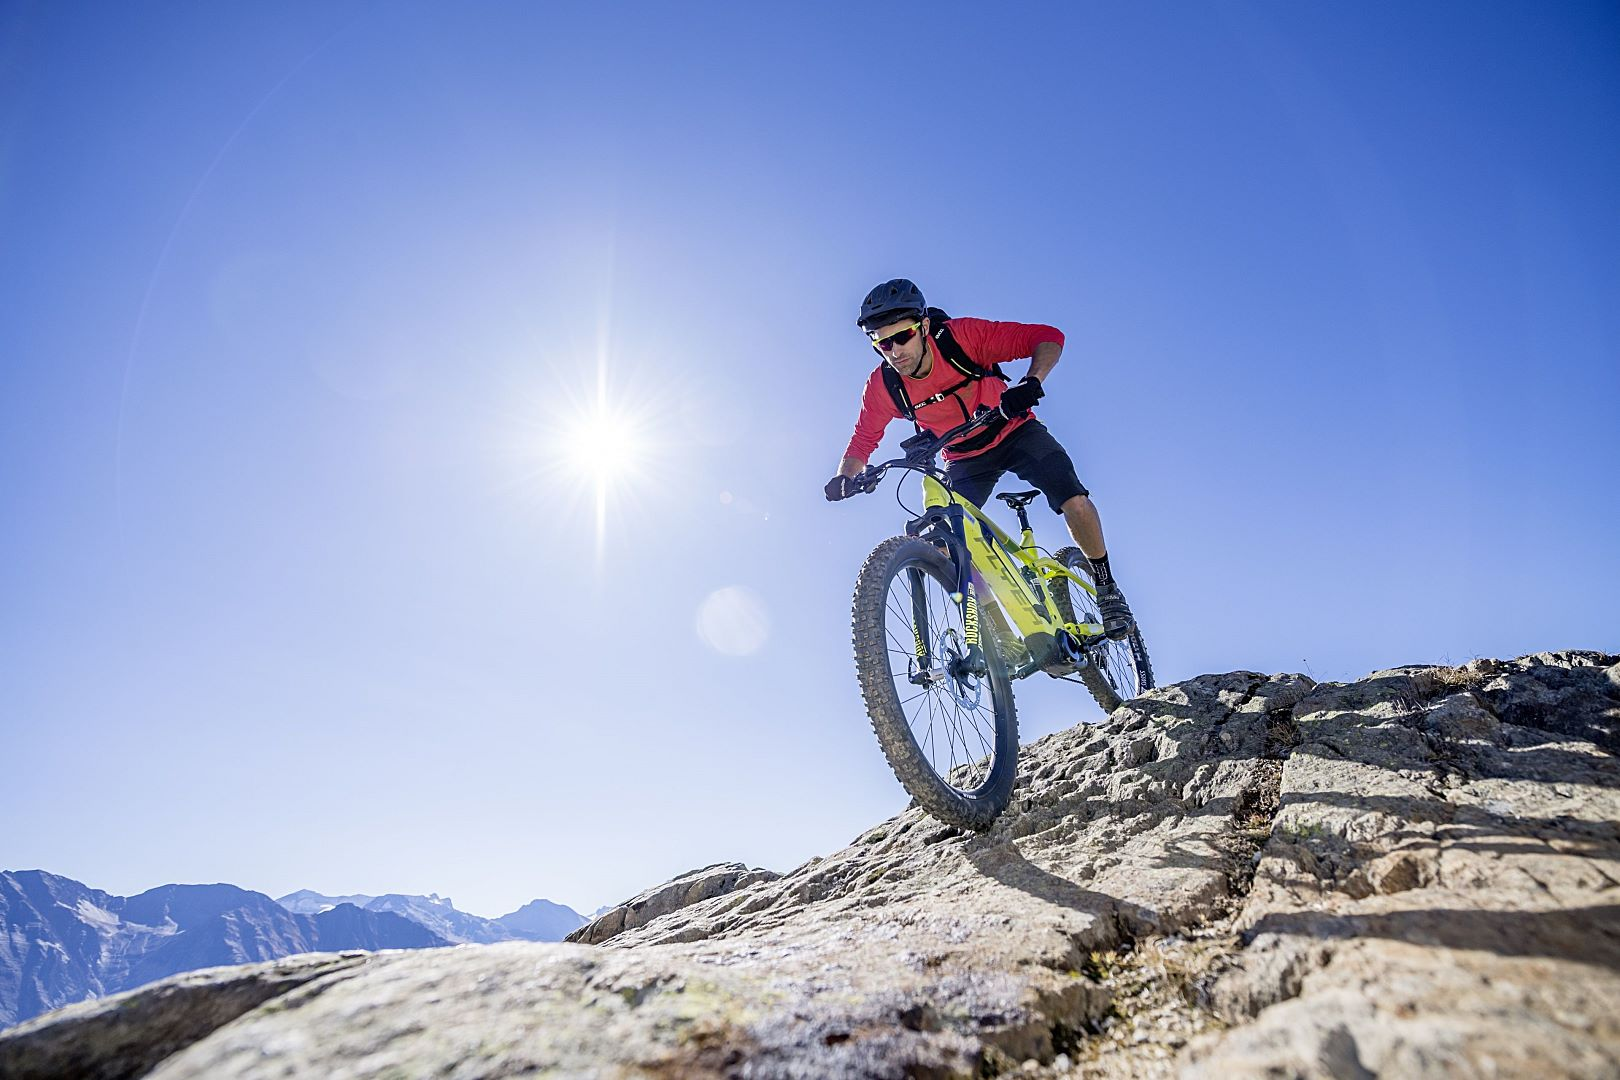 flyer-e-bikes-mountain-3505771